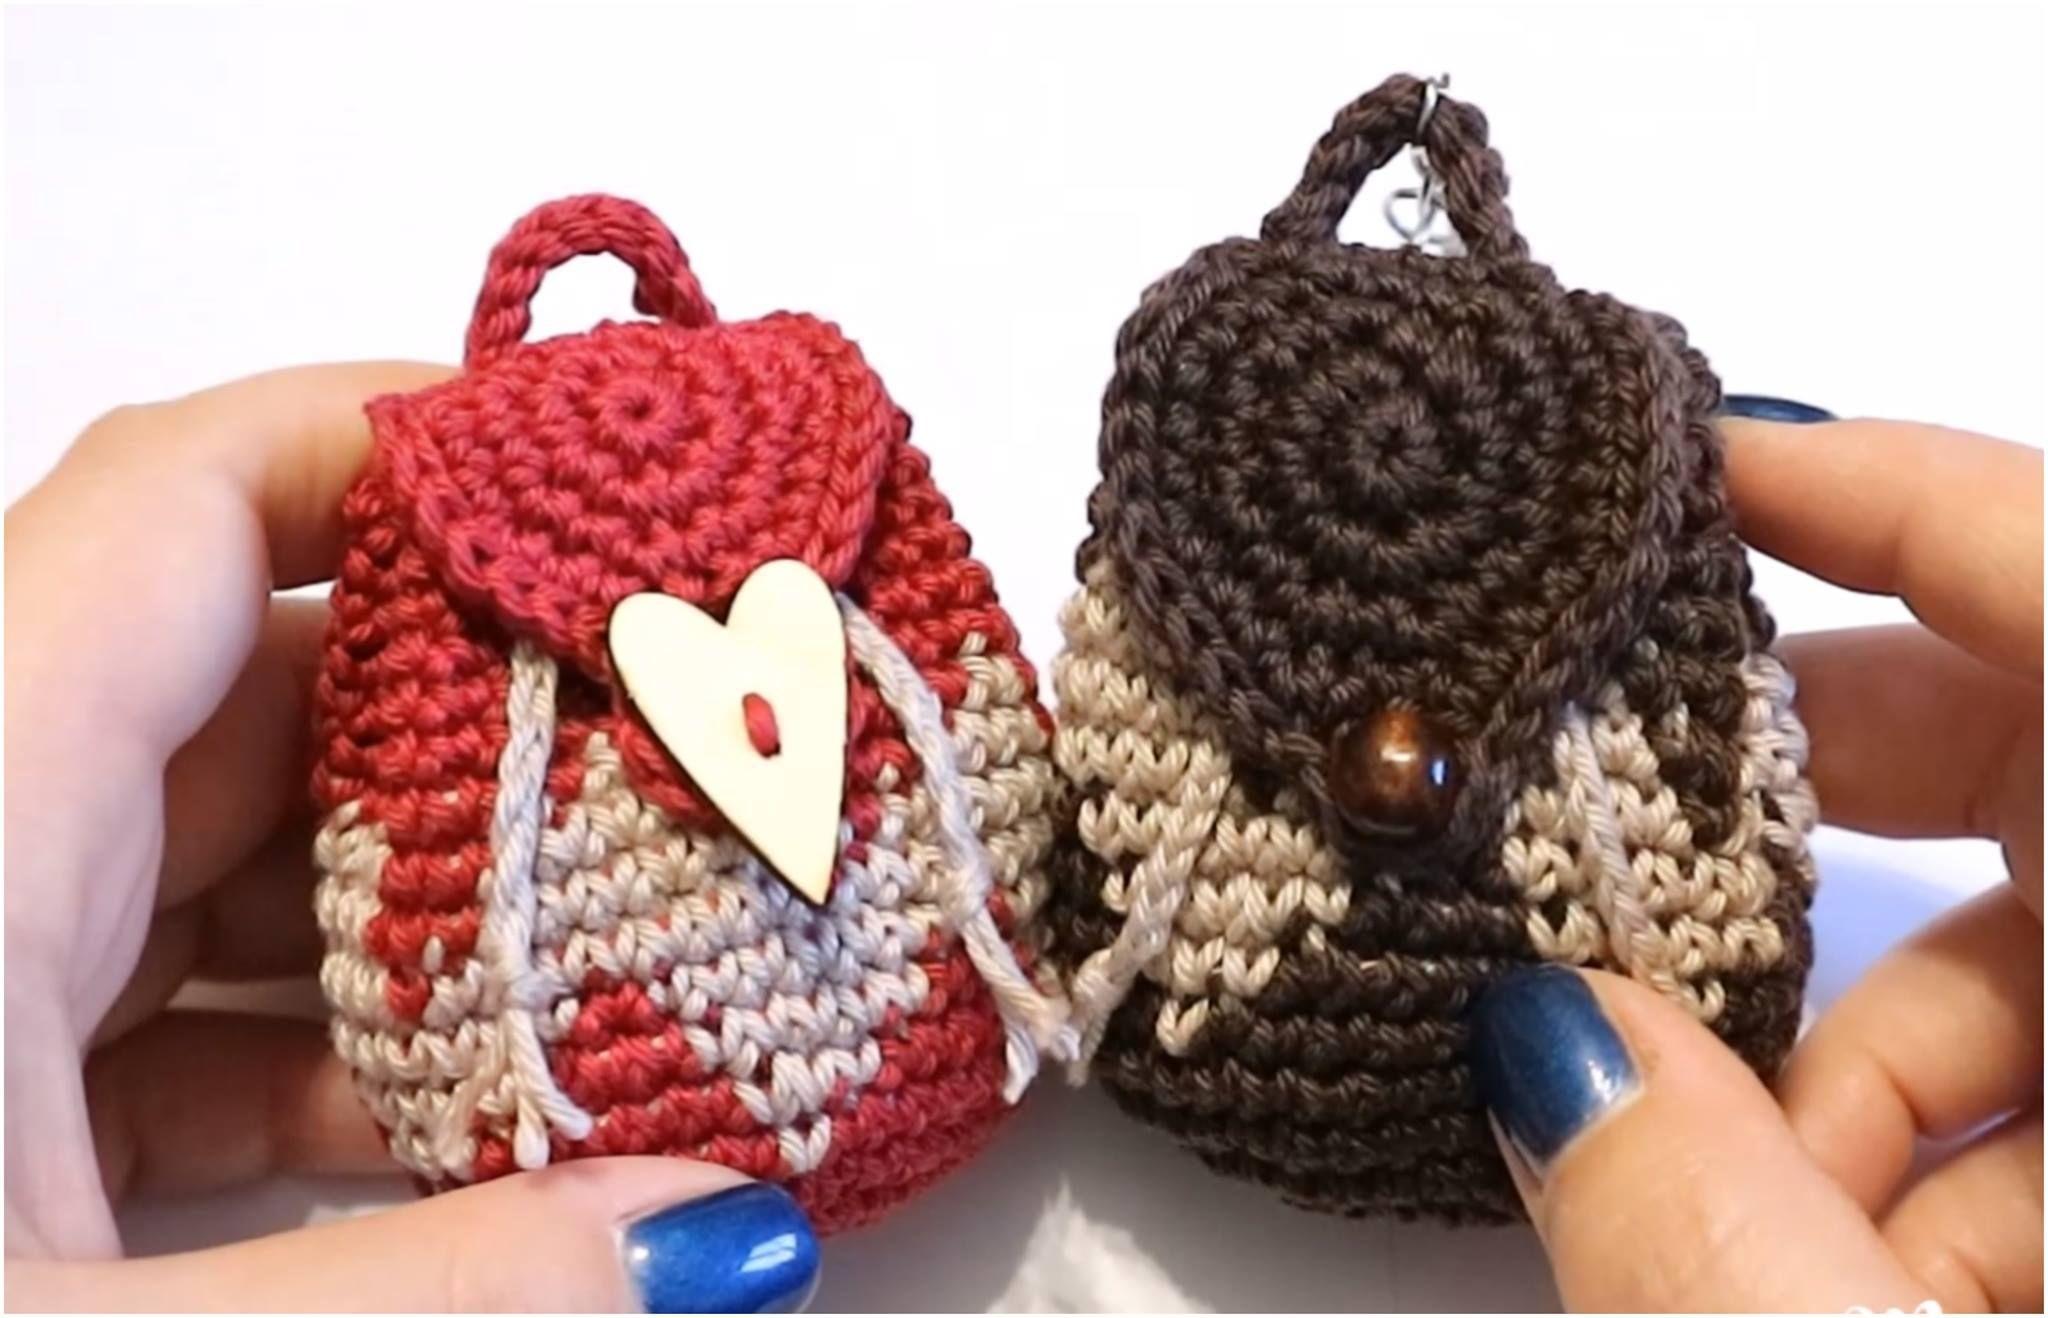 Crochet Tapestry Mini Backpack Purse | Blumen aus Knöpfen, Häkeln ...